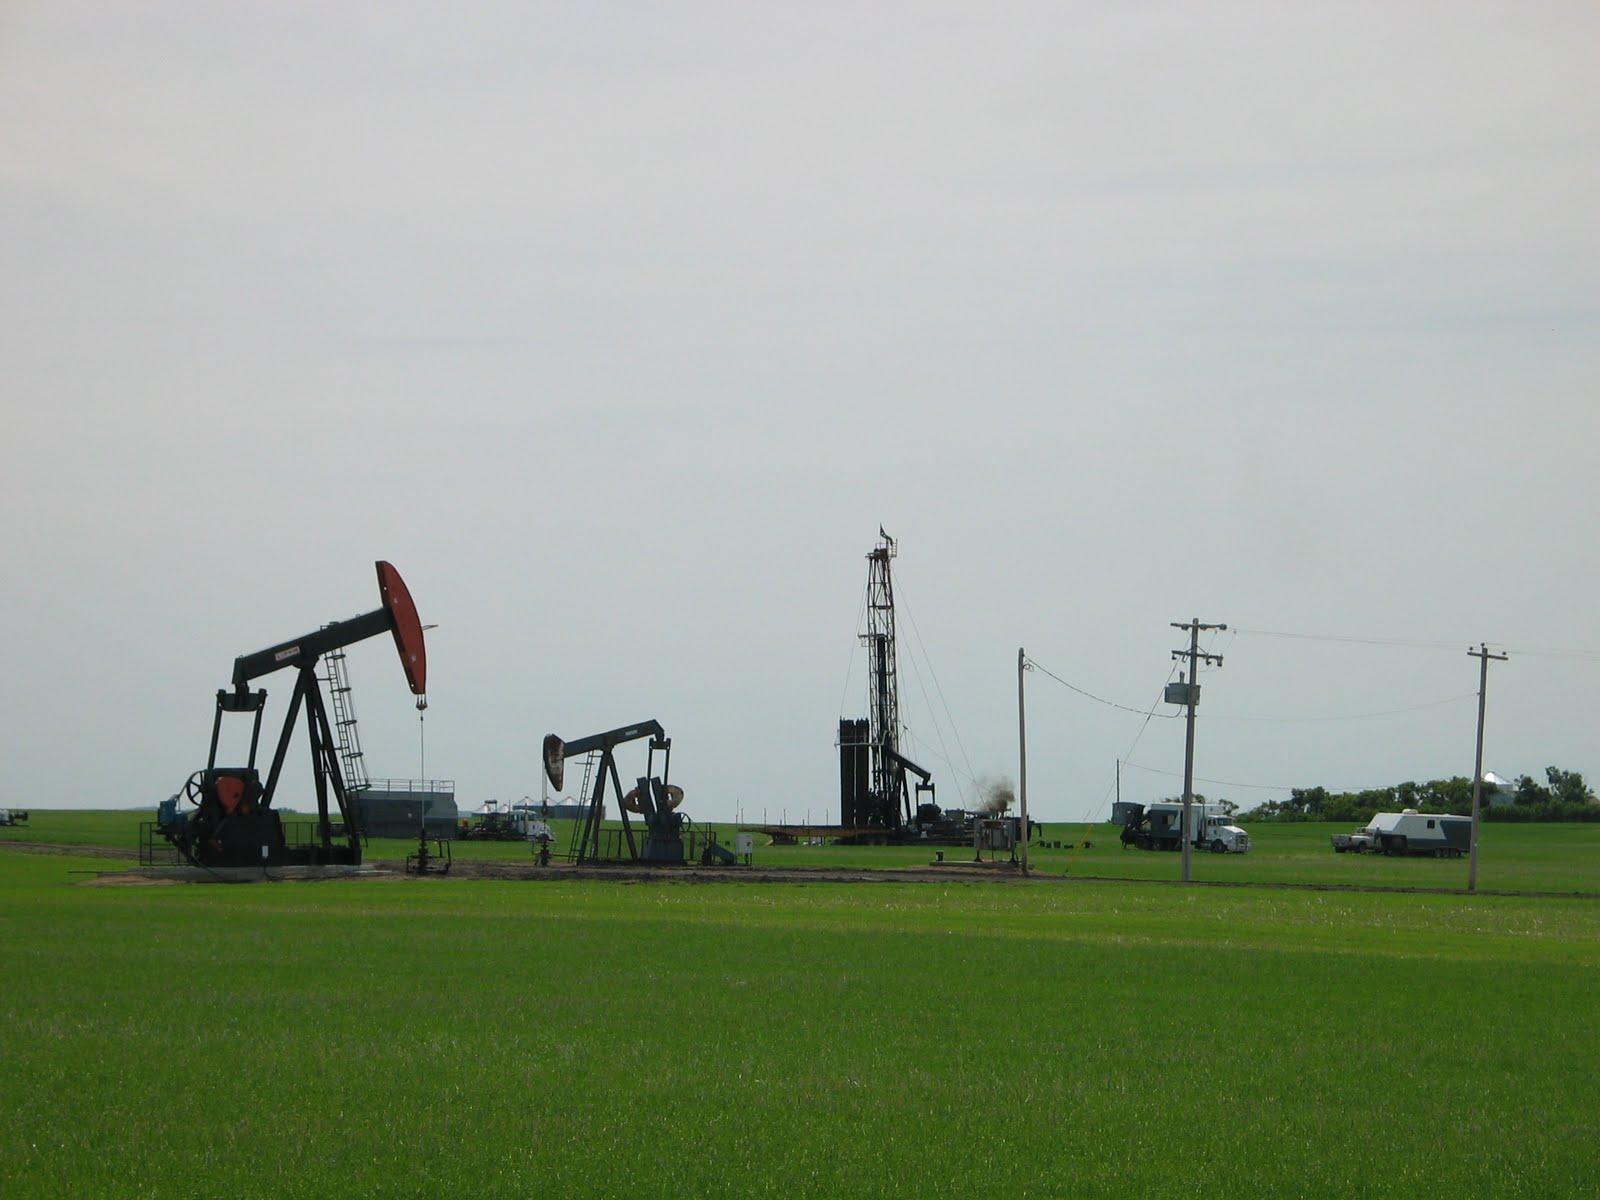 Ja knikkers' van de olieindustrie alberta 7135